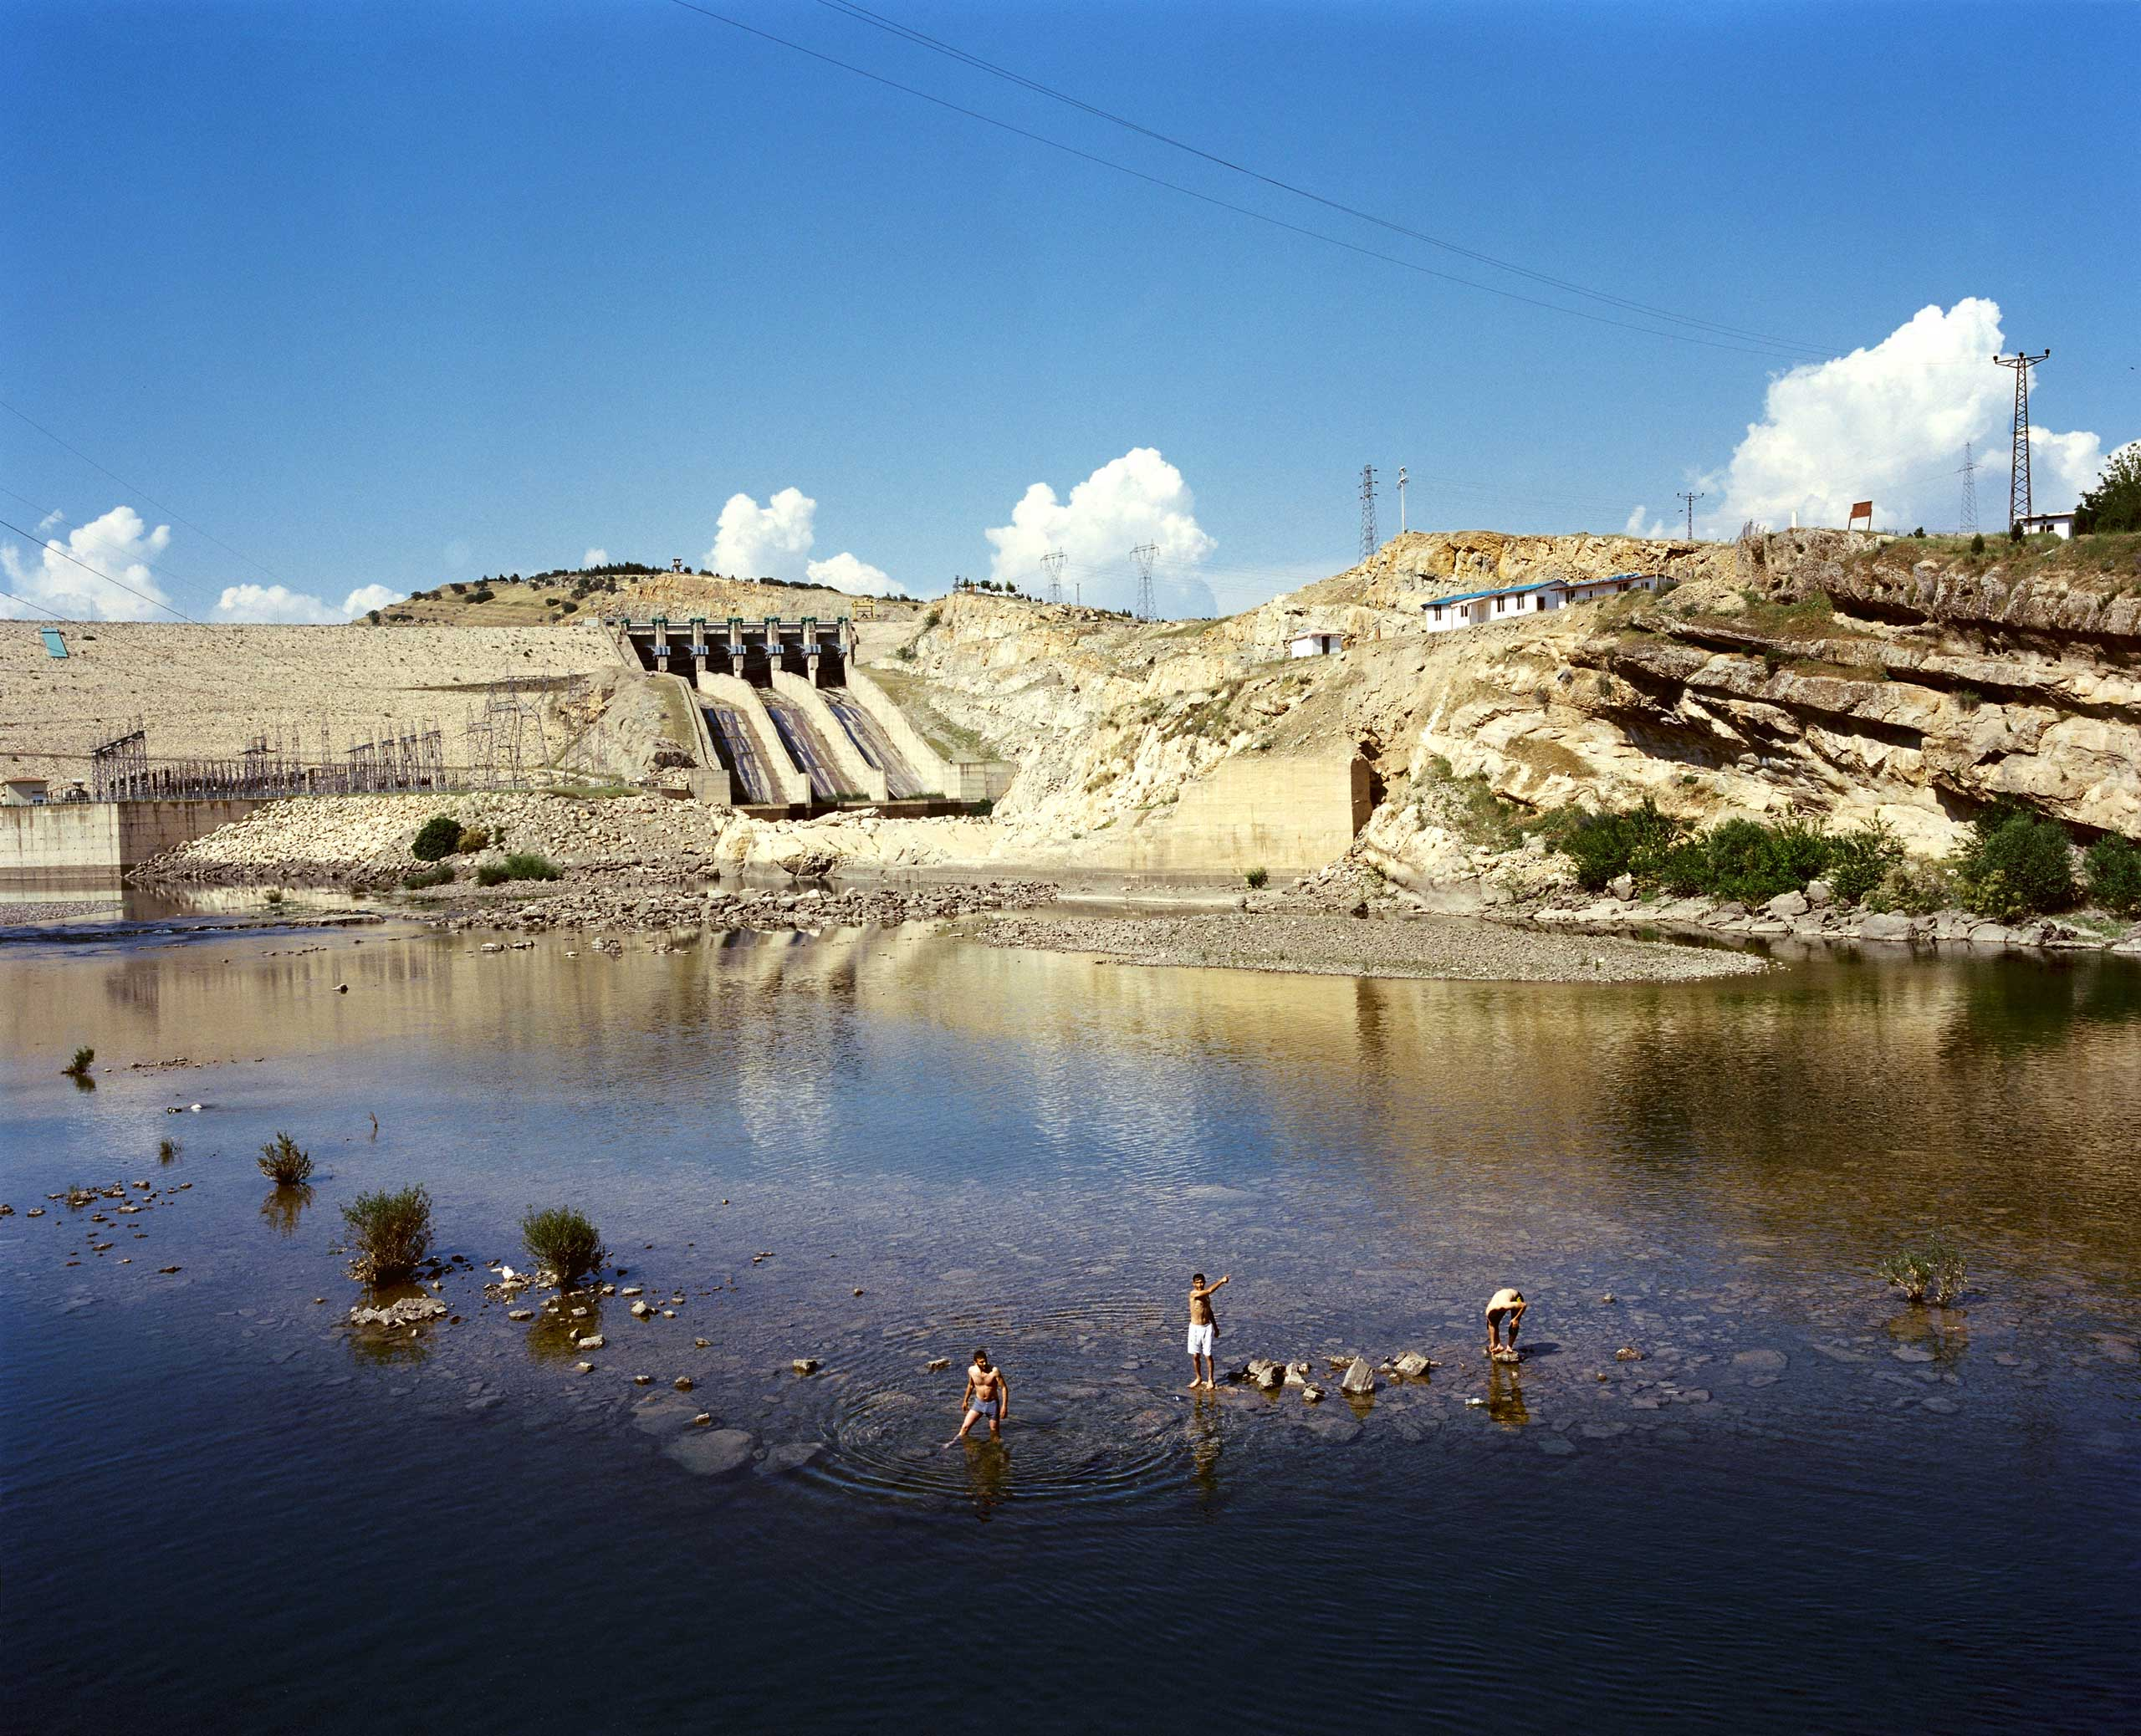 Men are swimming in the waters of the Batman Dam. Batman, Turkey.